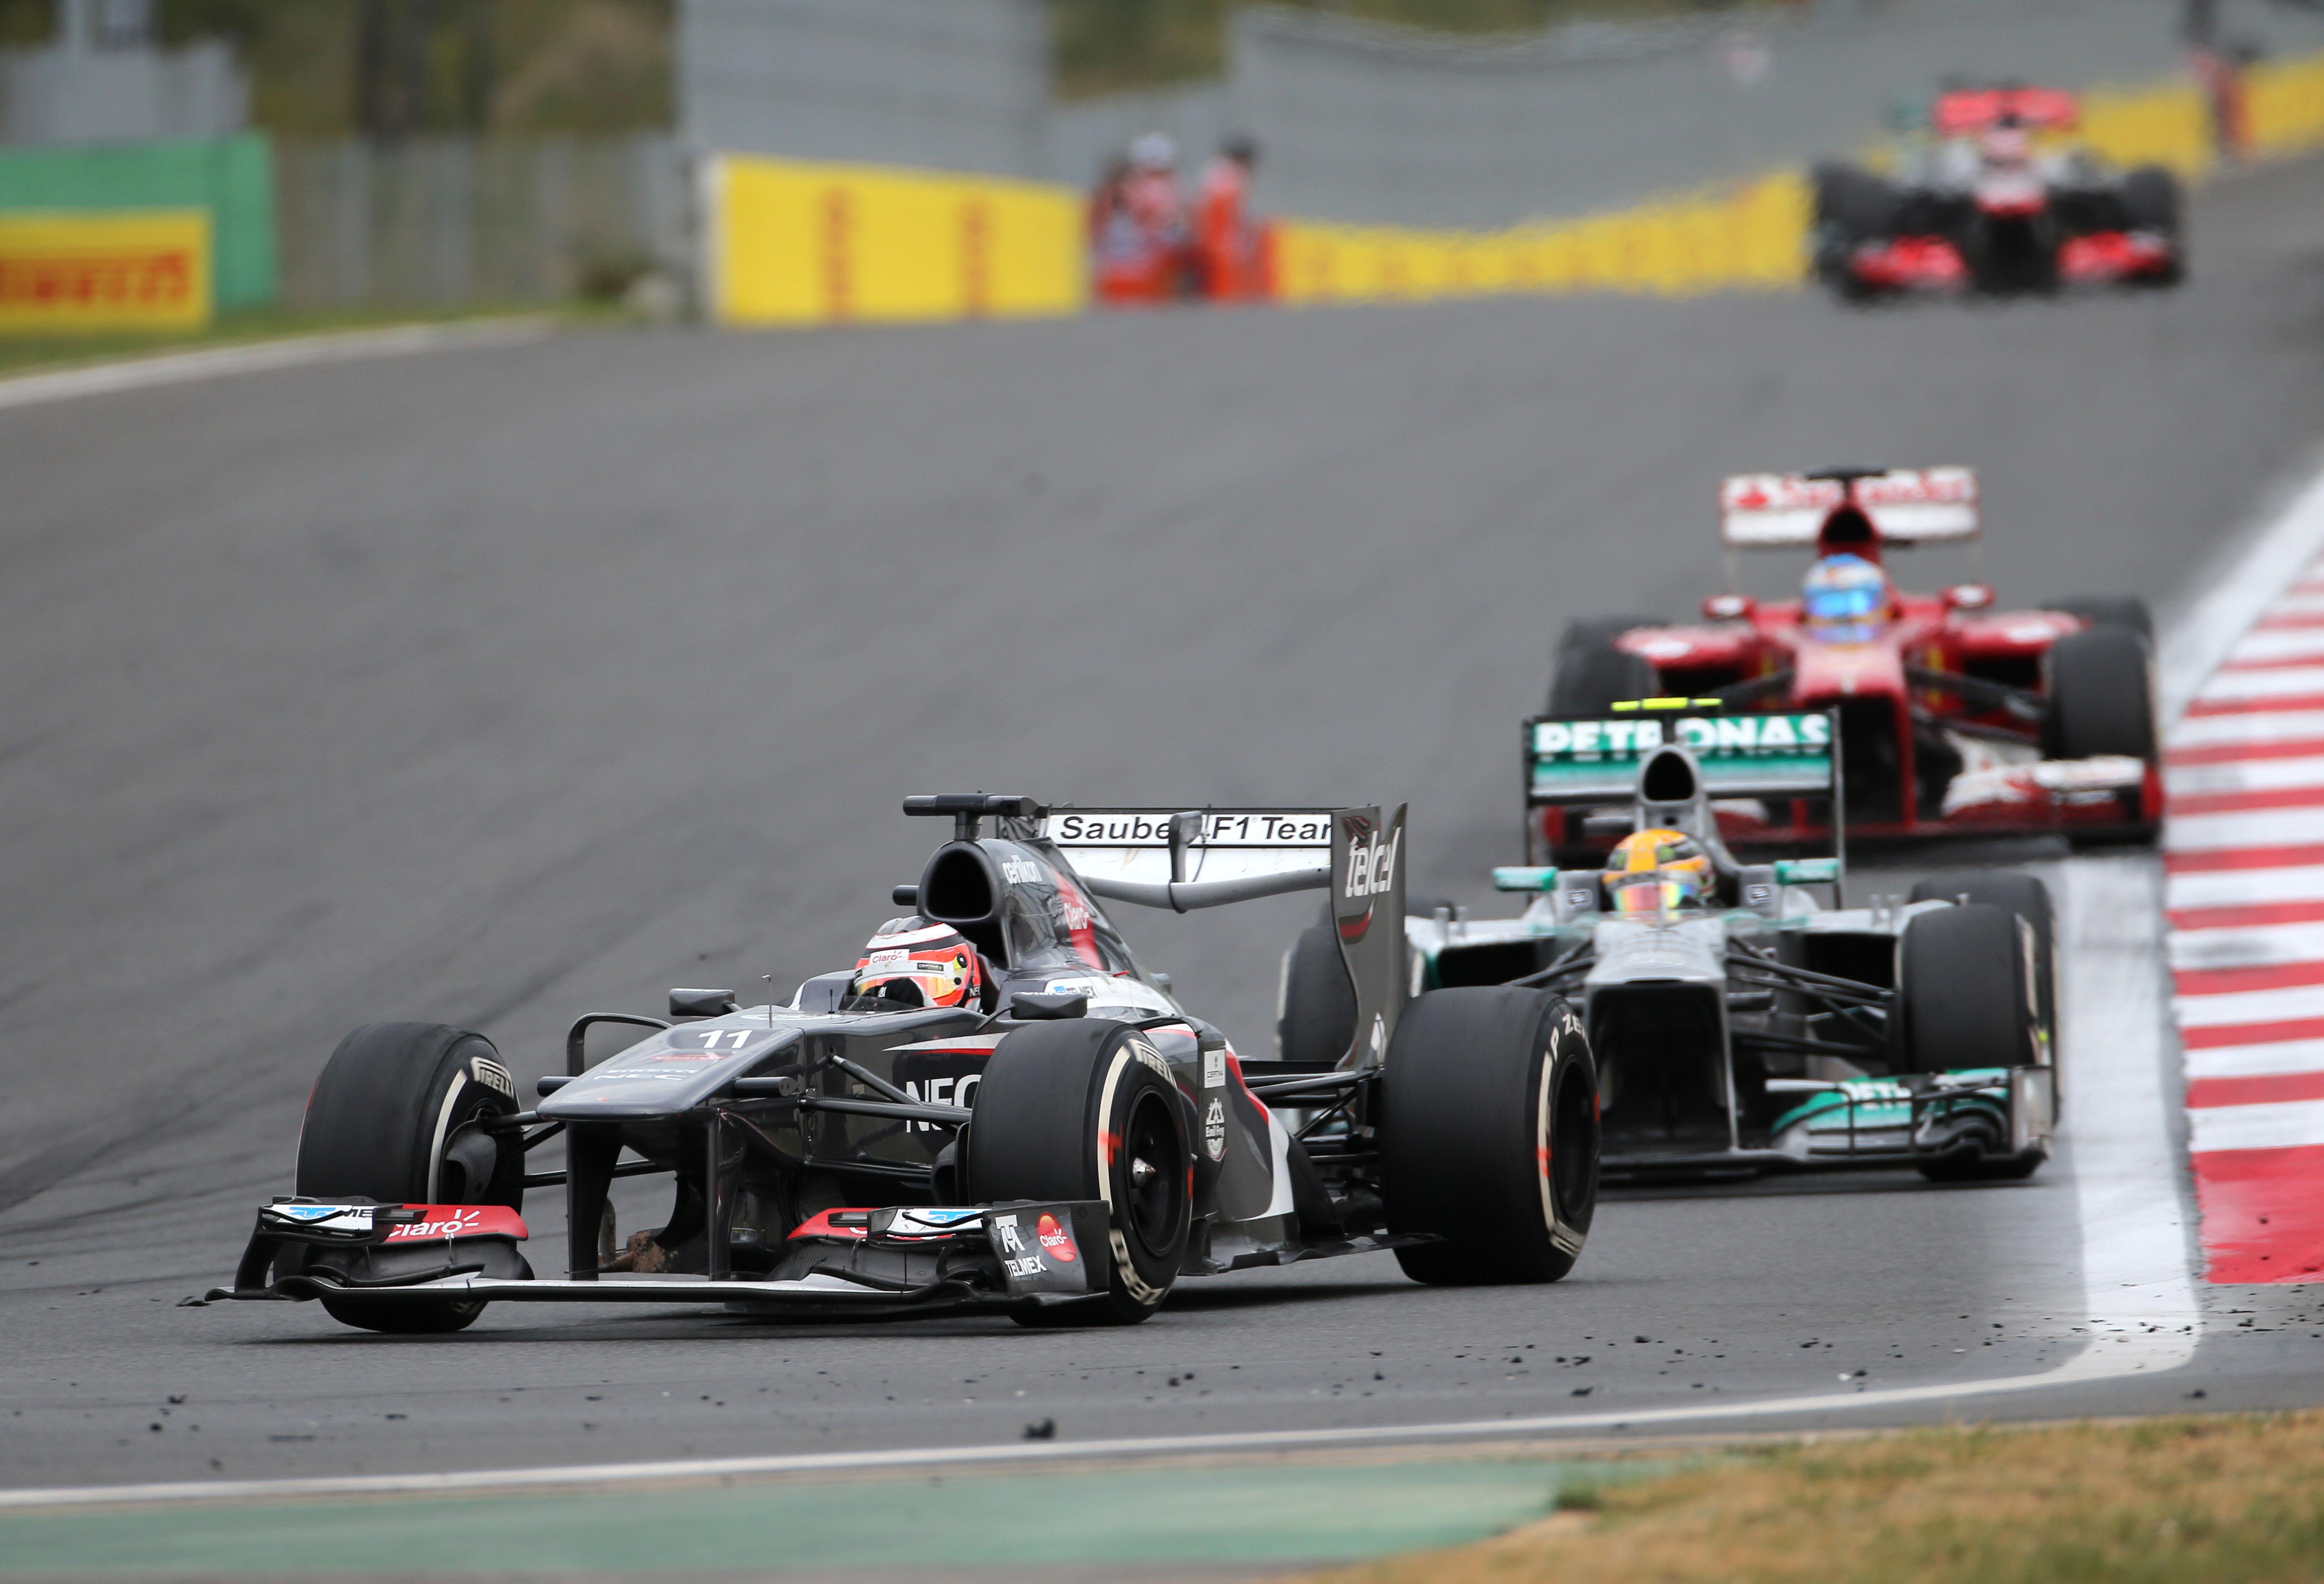 Nico Hulkenberg Sauber Korean Grand Prix 2013